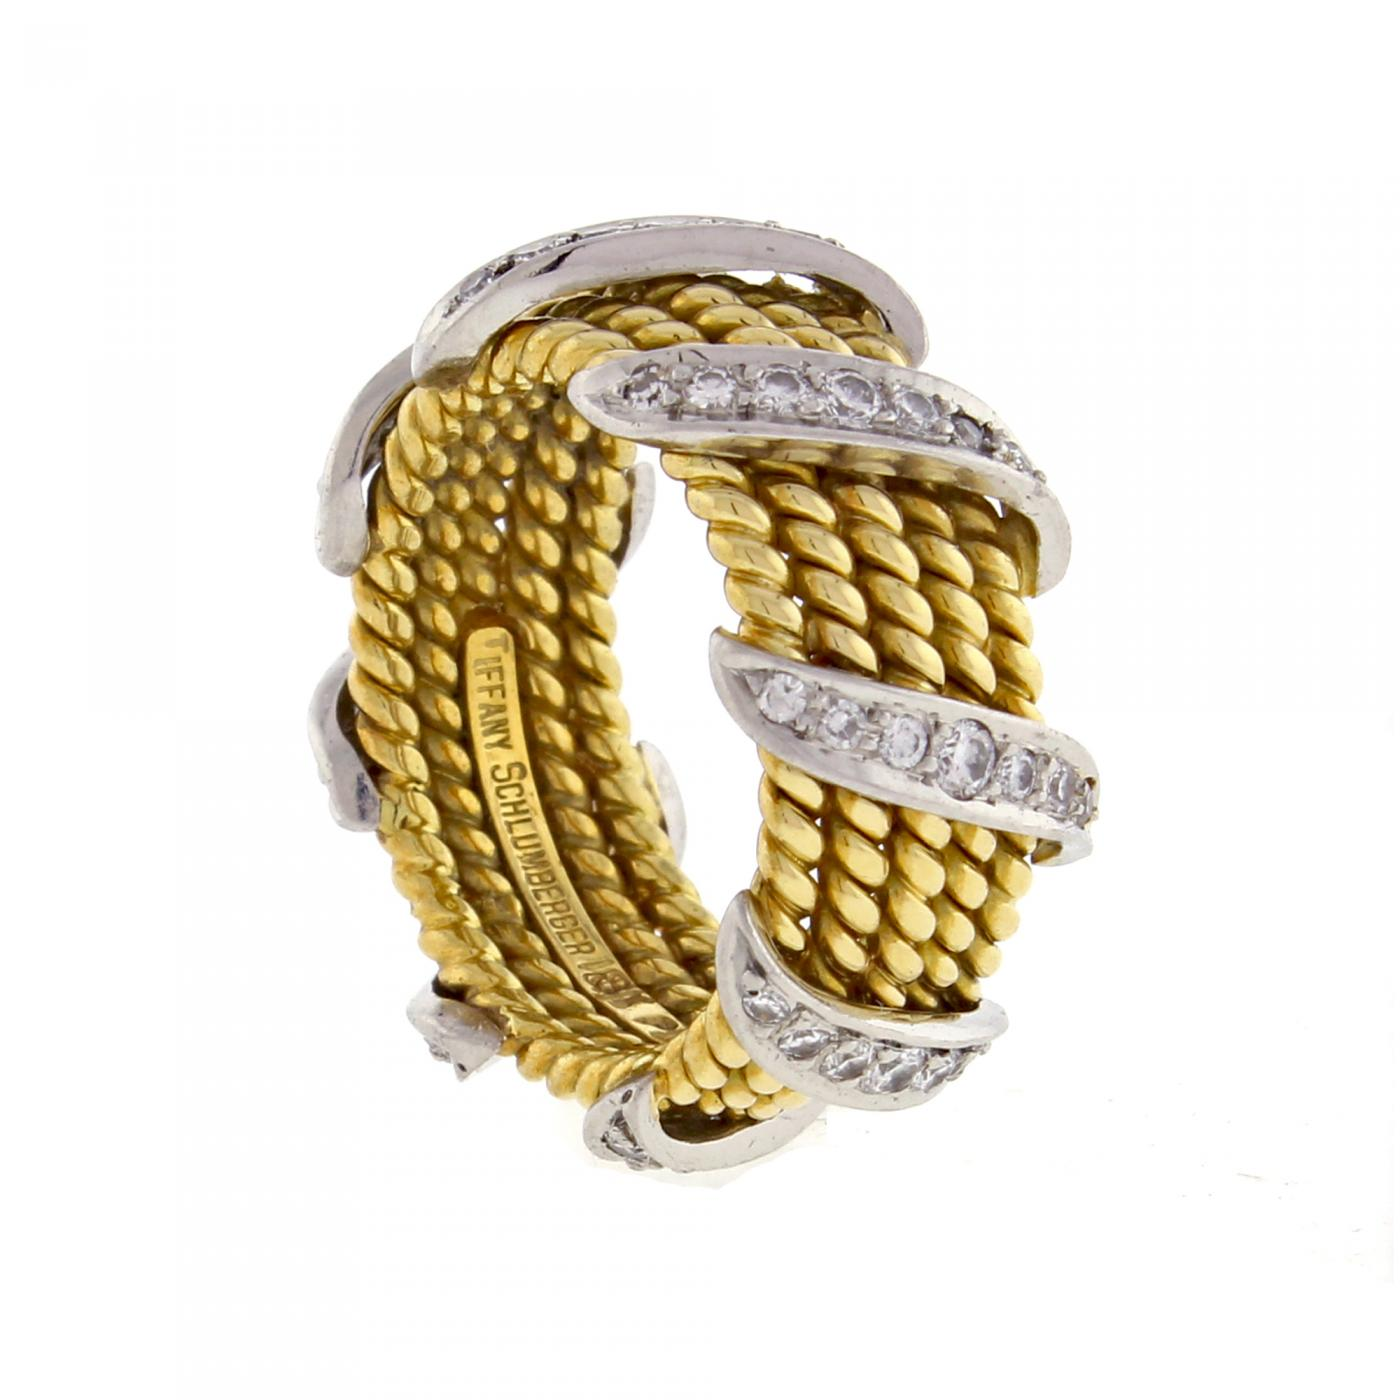 f81dea2eb4526 Tiffany and Co. - Tiffany & Co. Schlumberger Five-Row Diamond Gold Wrap  Band Ring